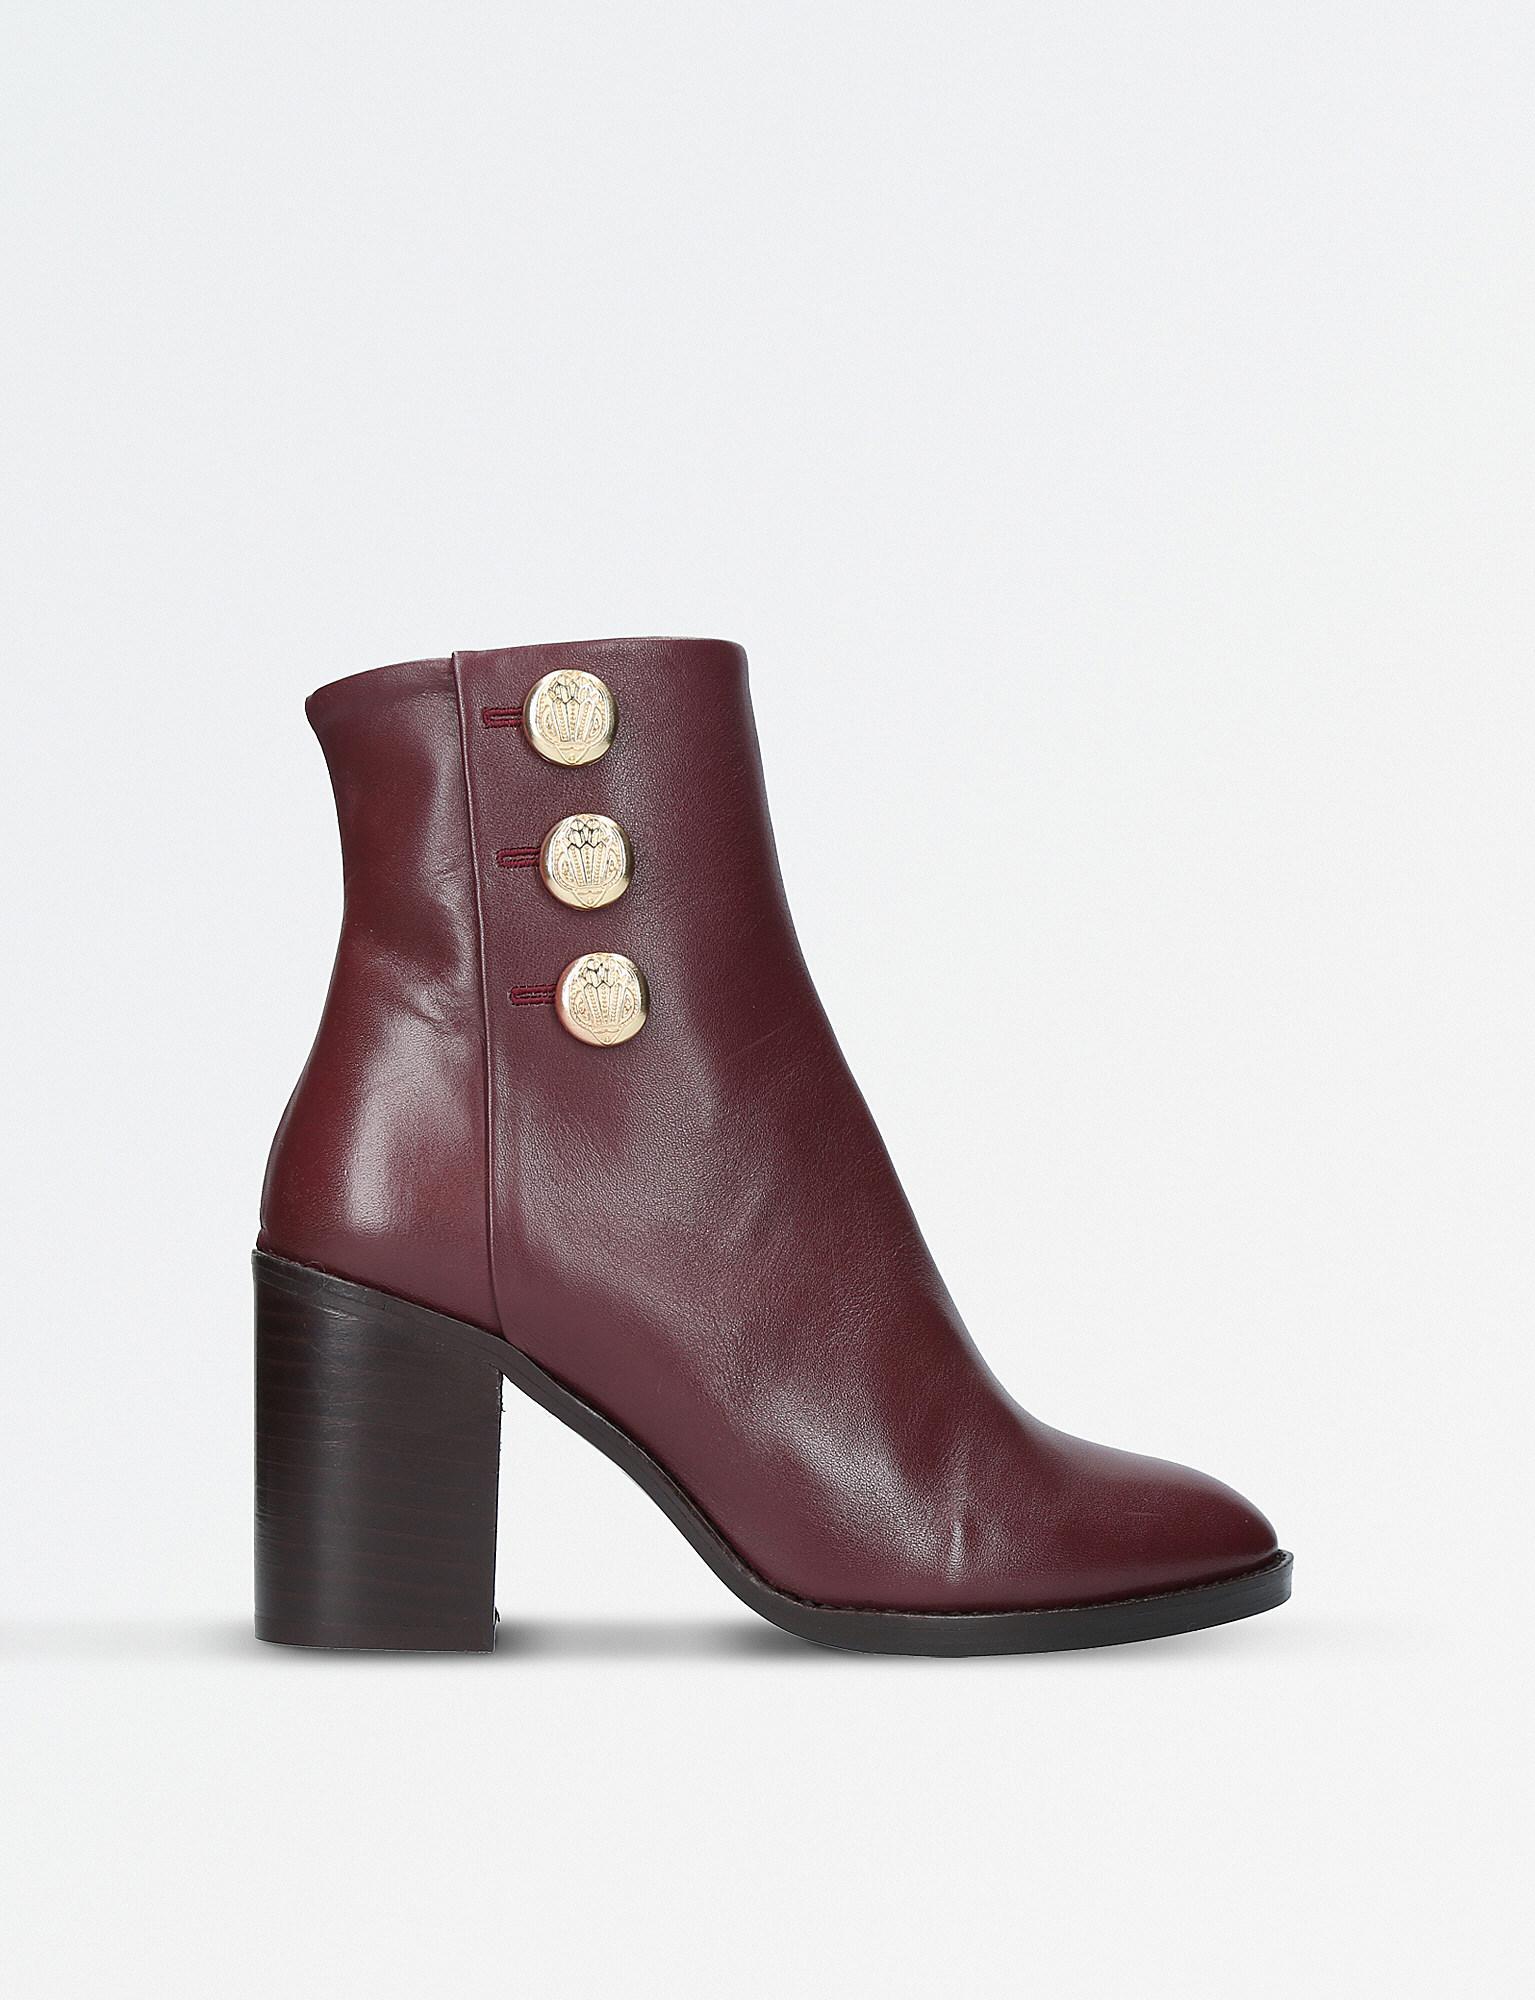 4355f4d0287f0 Lyst - Kurt Geiger Dante Leather Boots in Purple